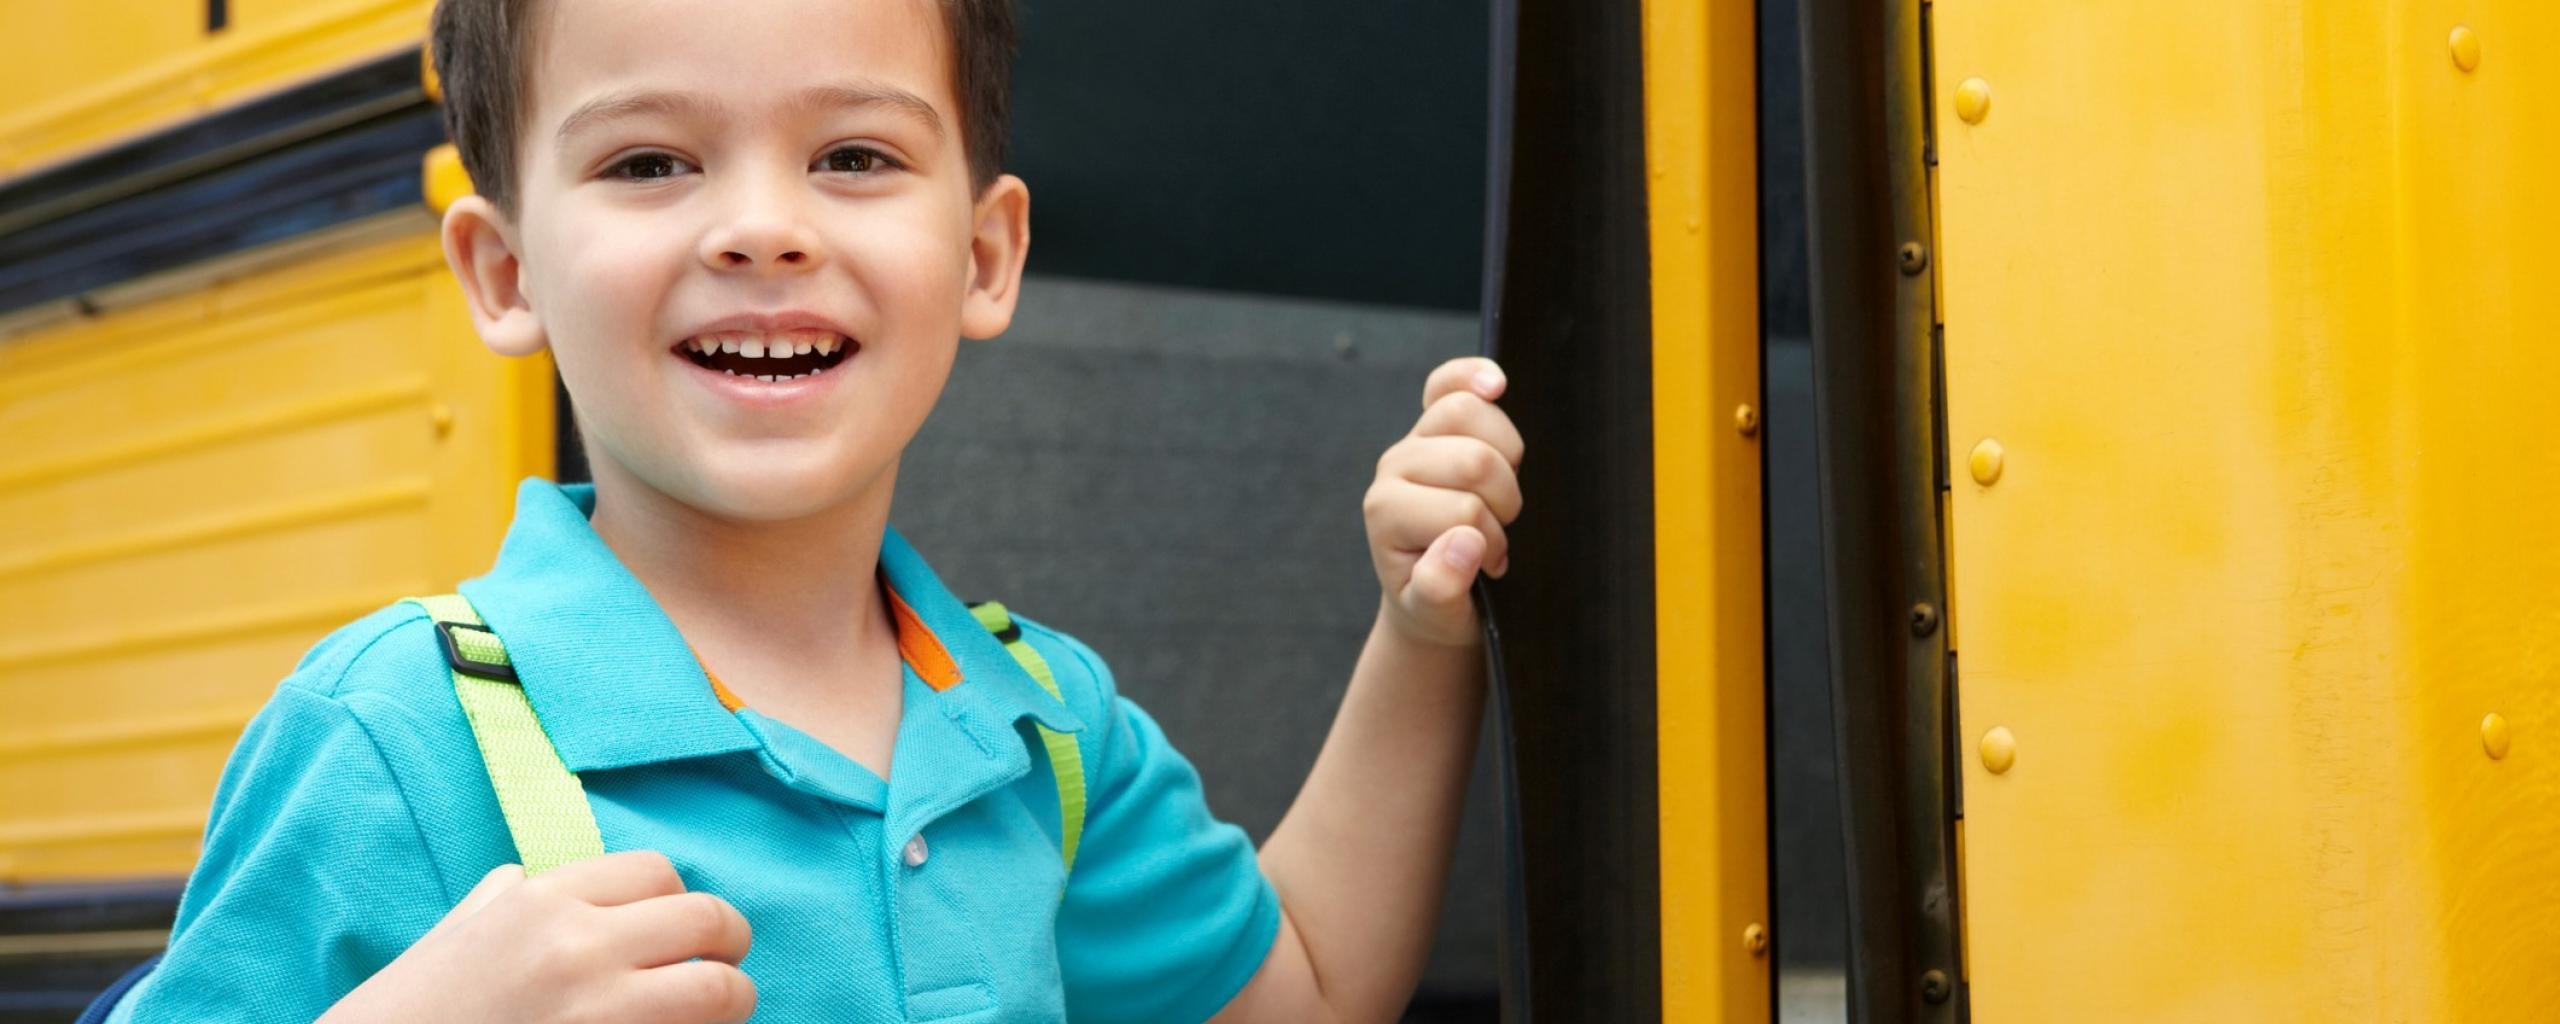 student boarding school bus